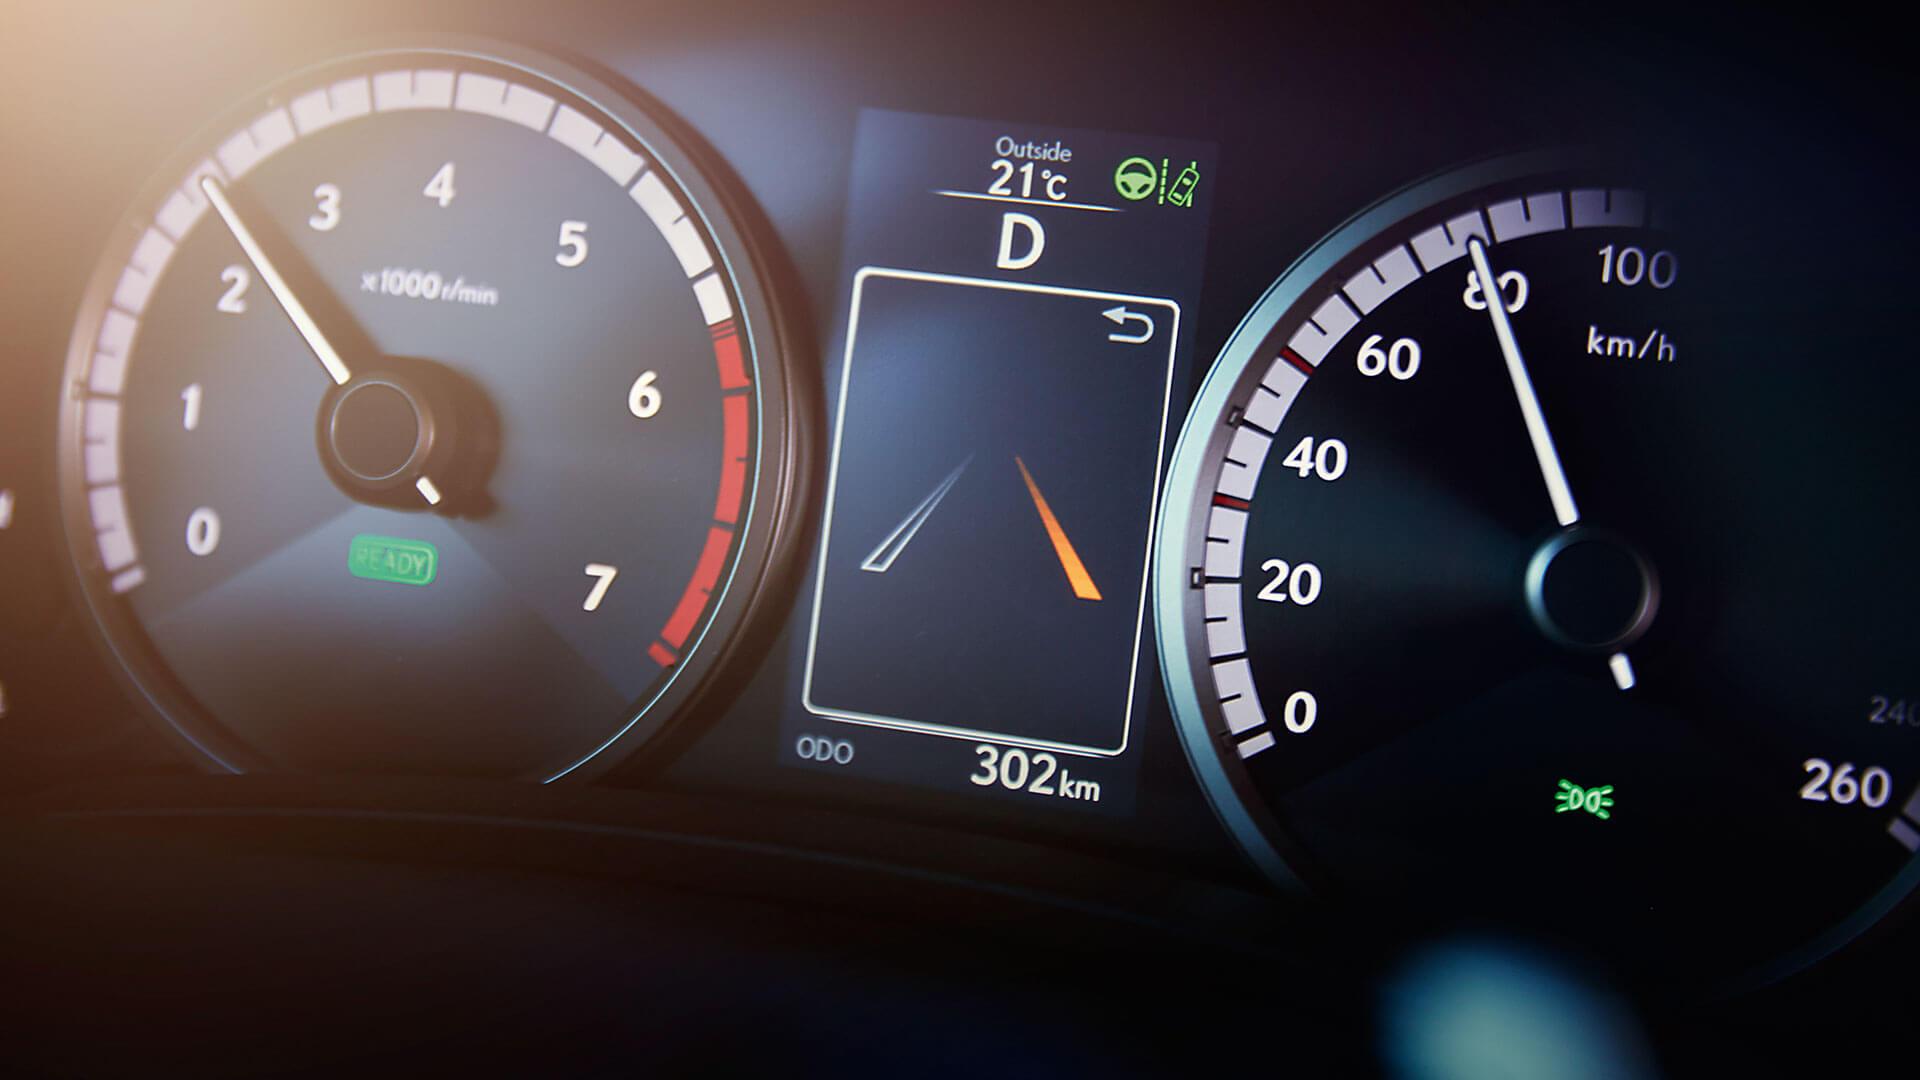 2017 lexus nx 300h features lane keeping assist